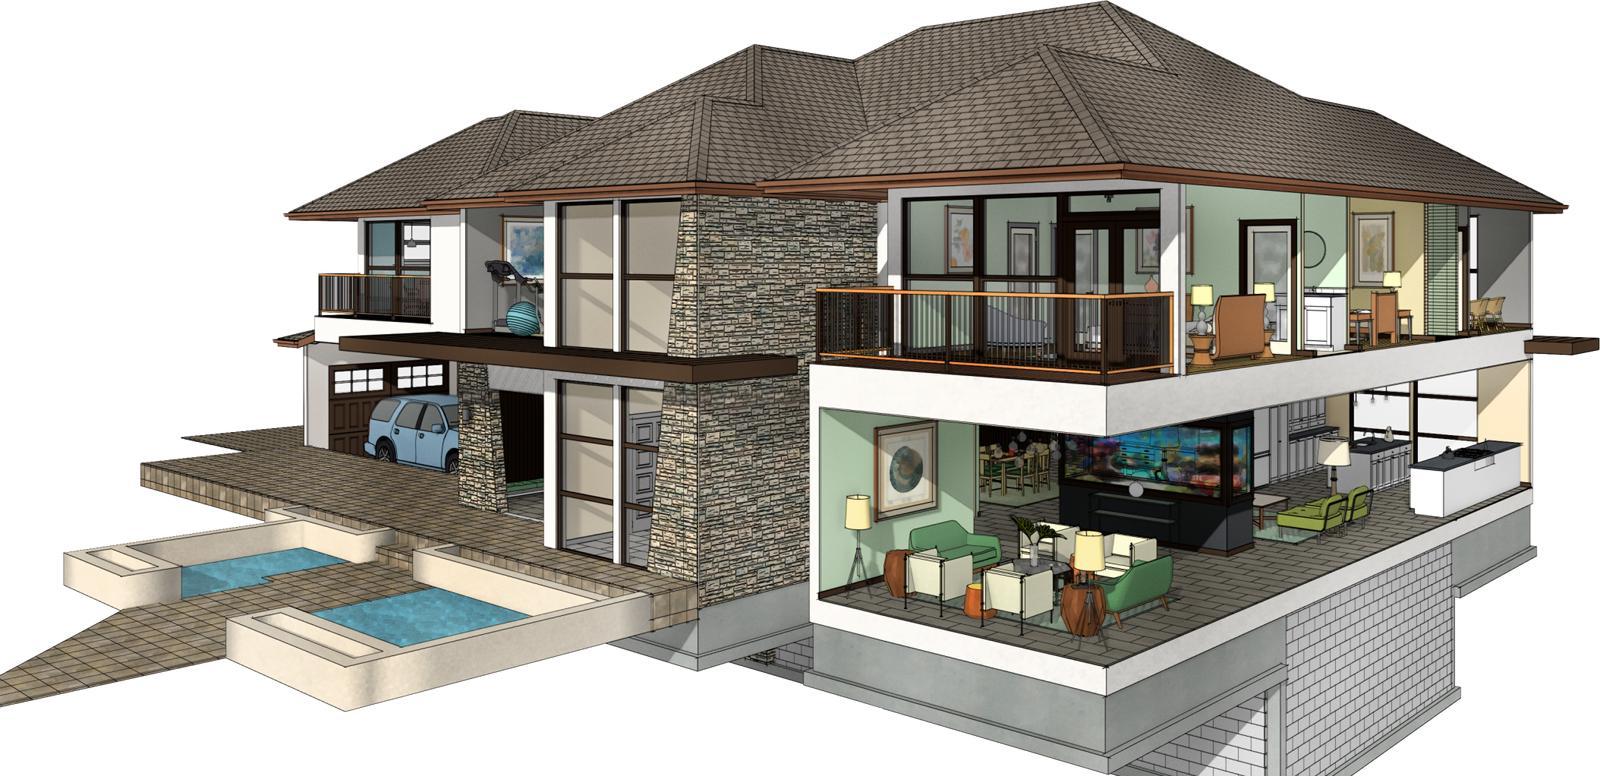 Home Designer Software For Home Design & Remodeling Projects